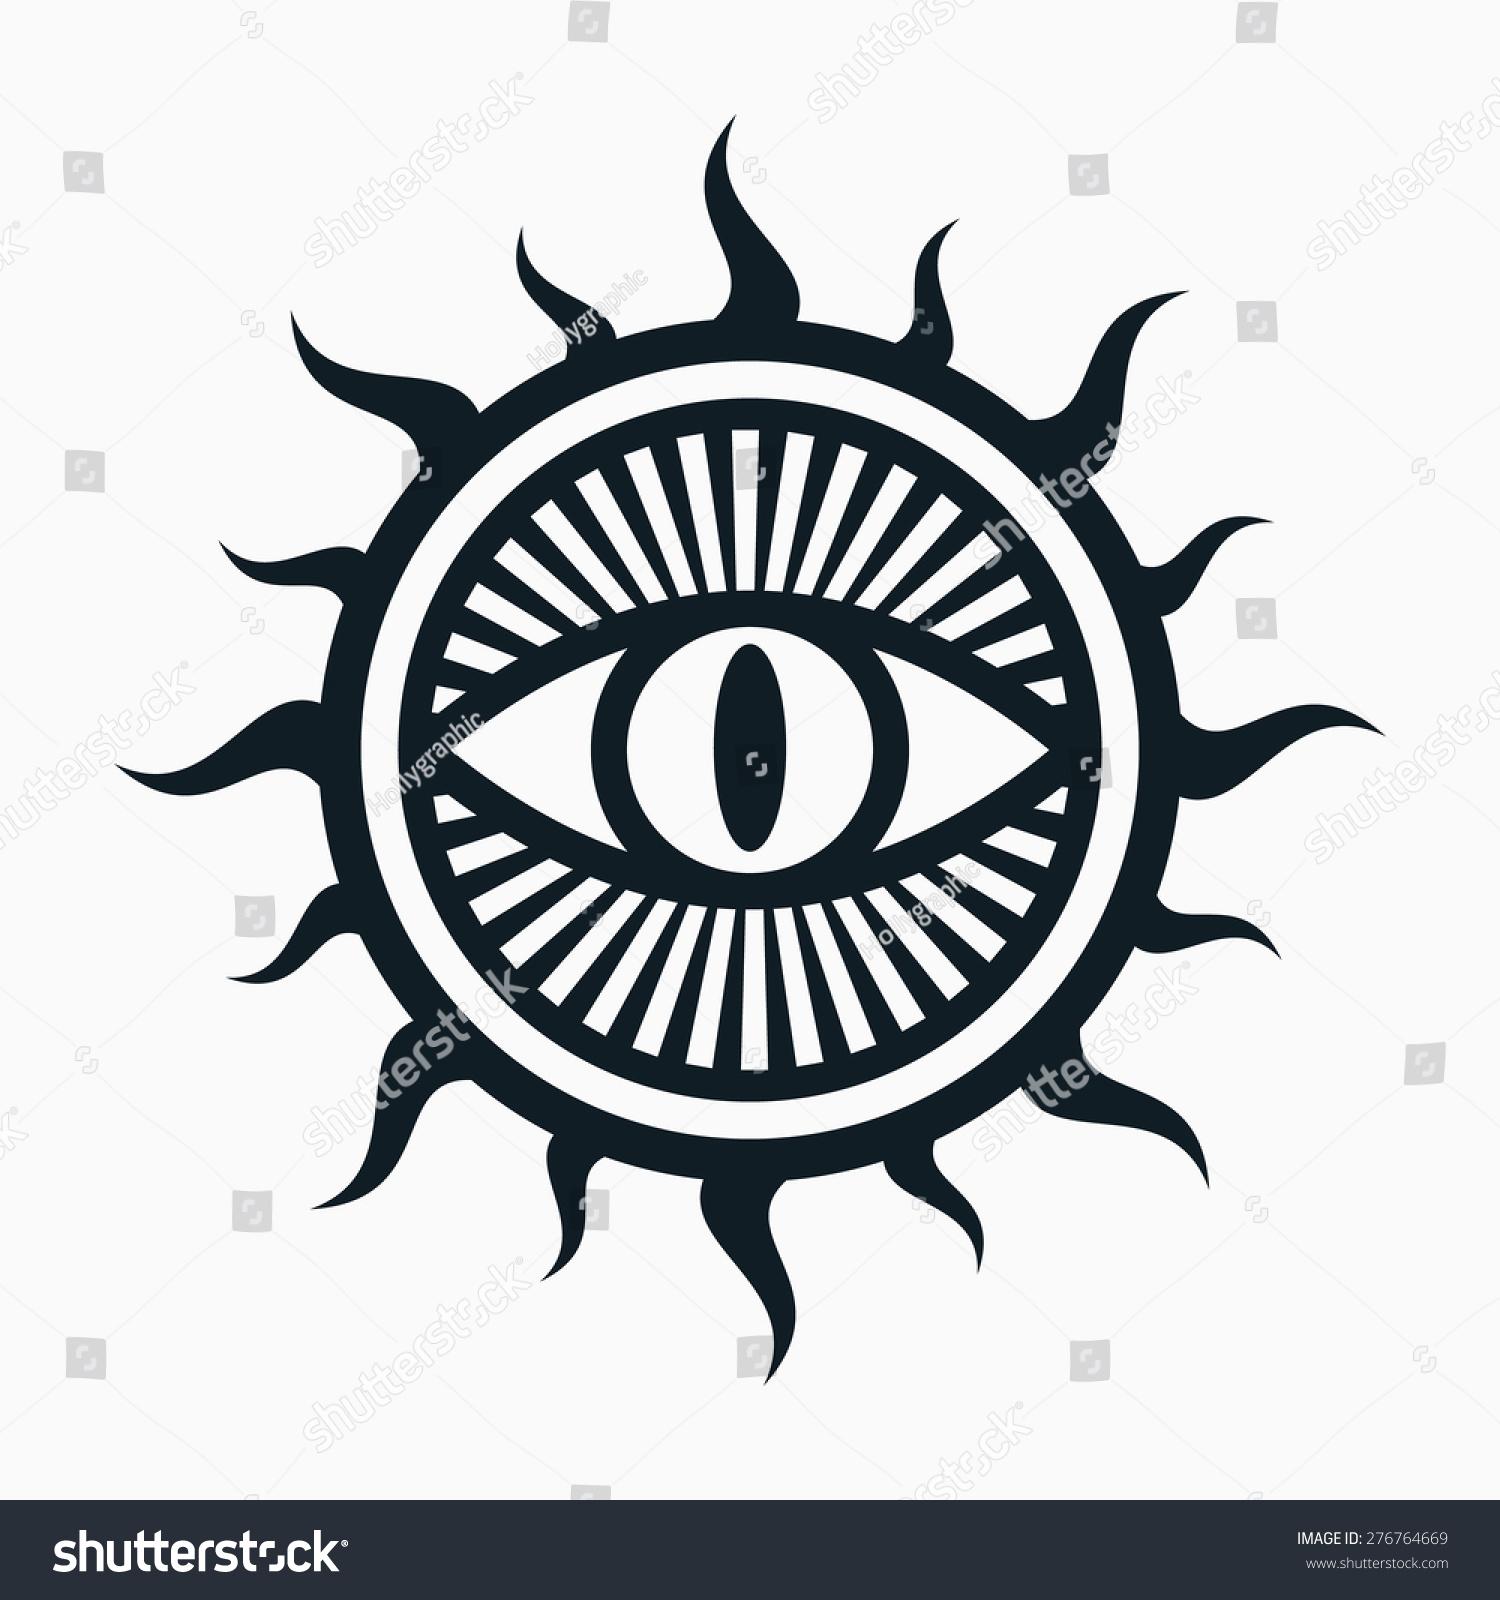 Occult symbol eye sun symbol stock vector 276764669 shutterstock occult symbol eye in sun symbol buycottarizona Images